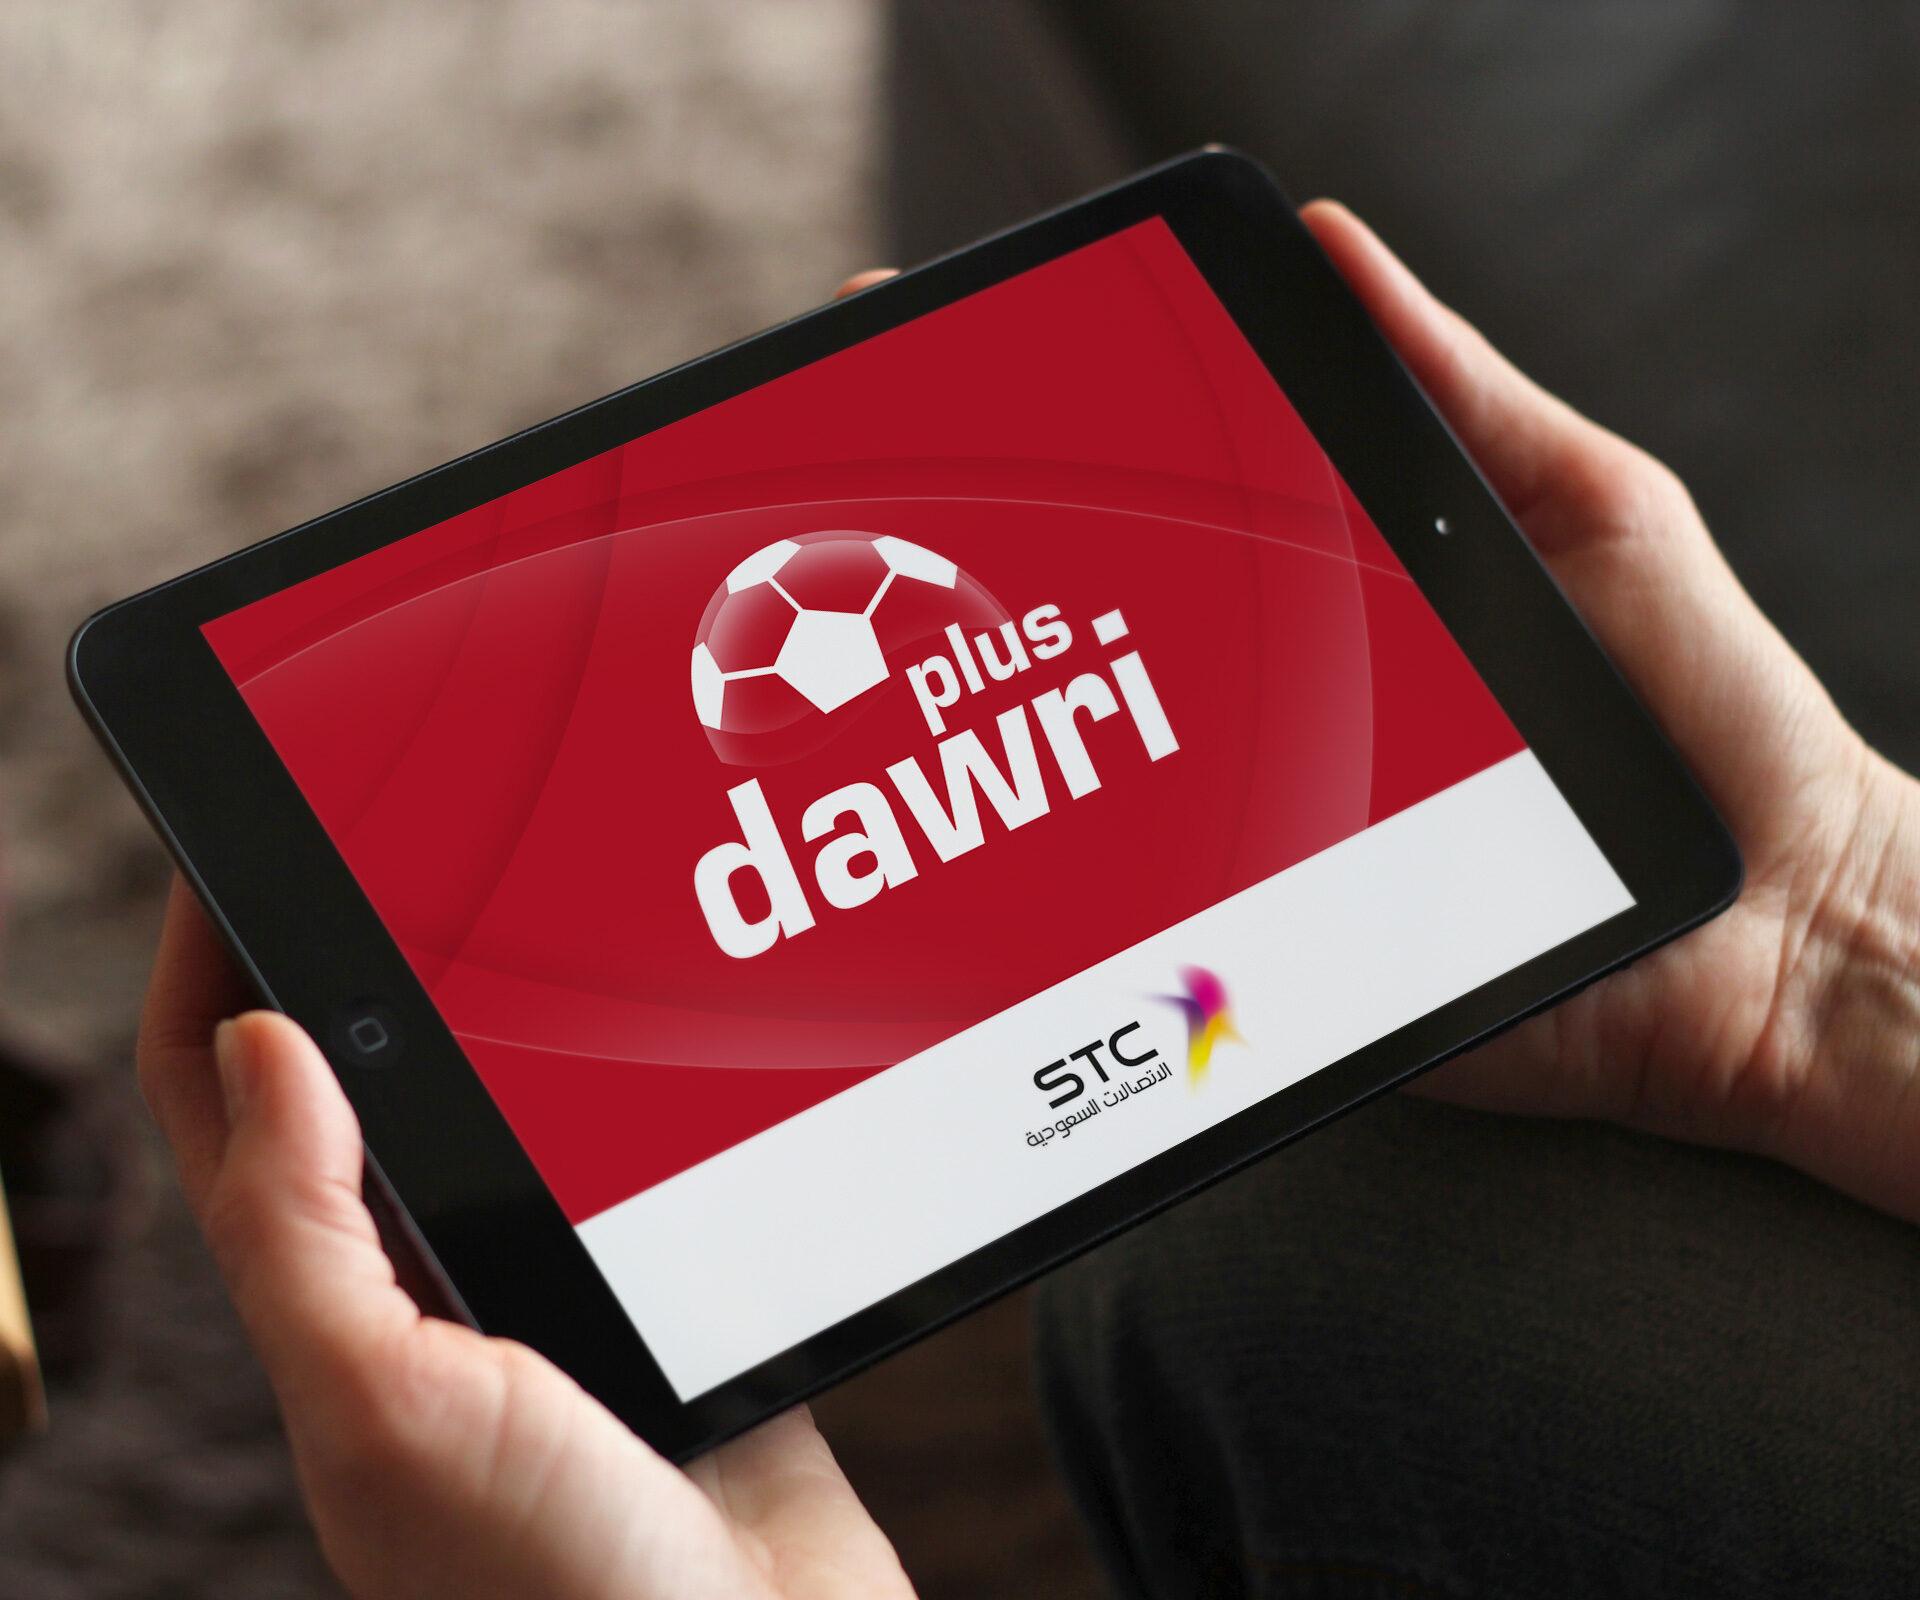 dawri6